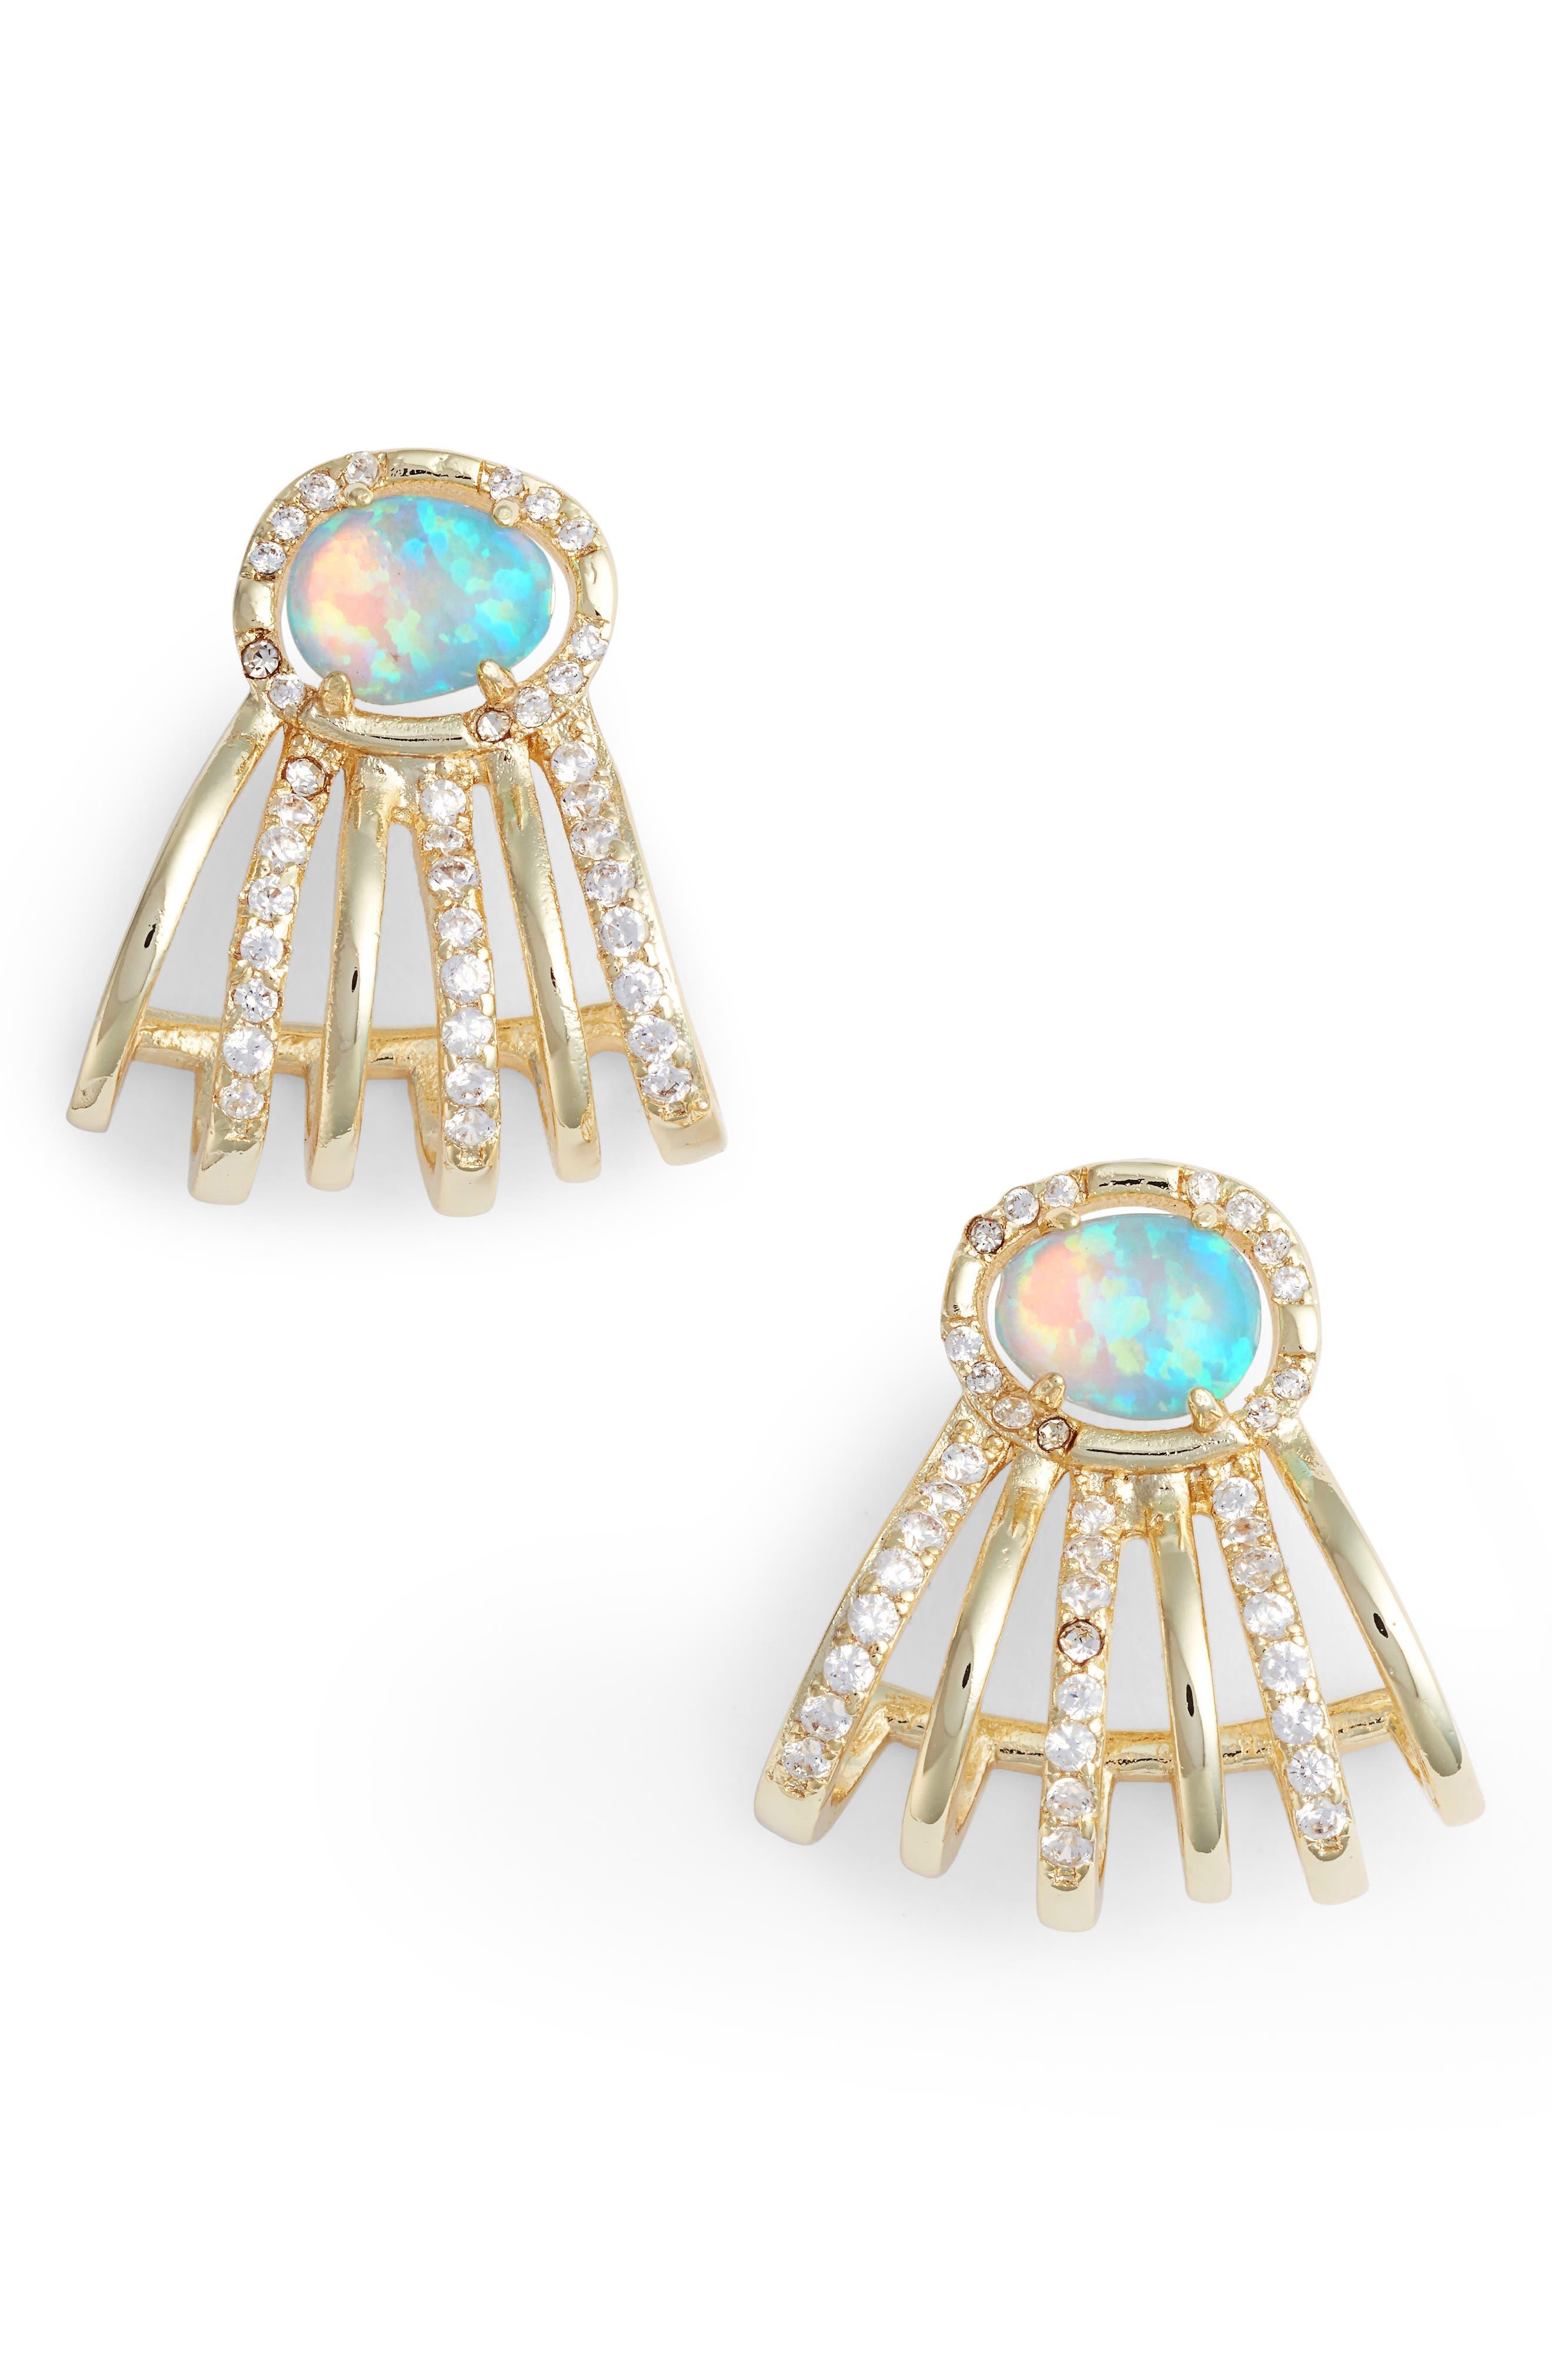 James Opal Earrings,                         Main,                         color, Opal/ Crystal